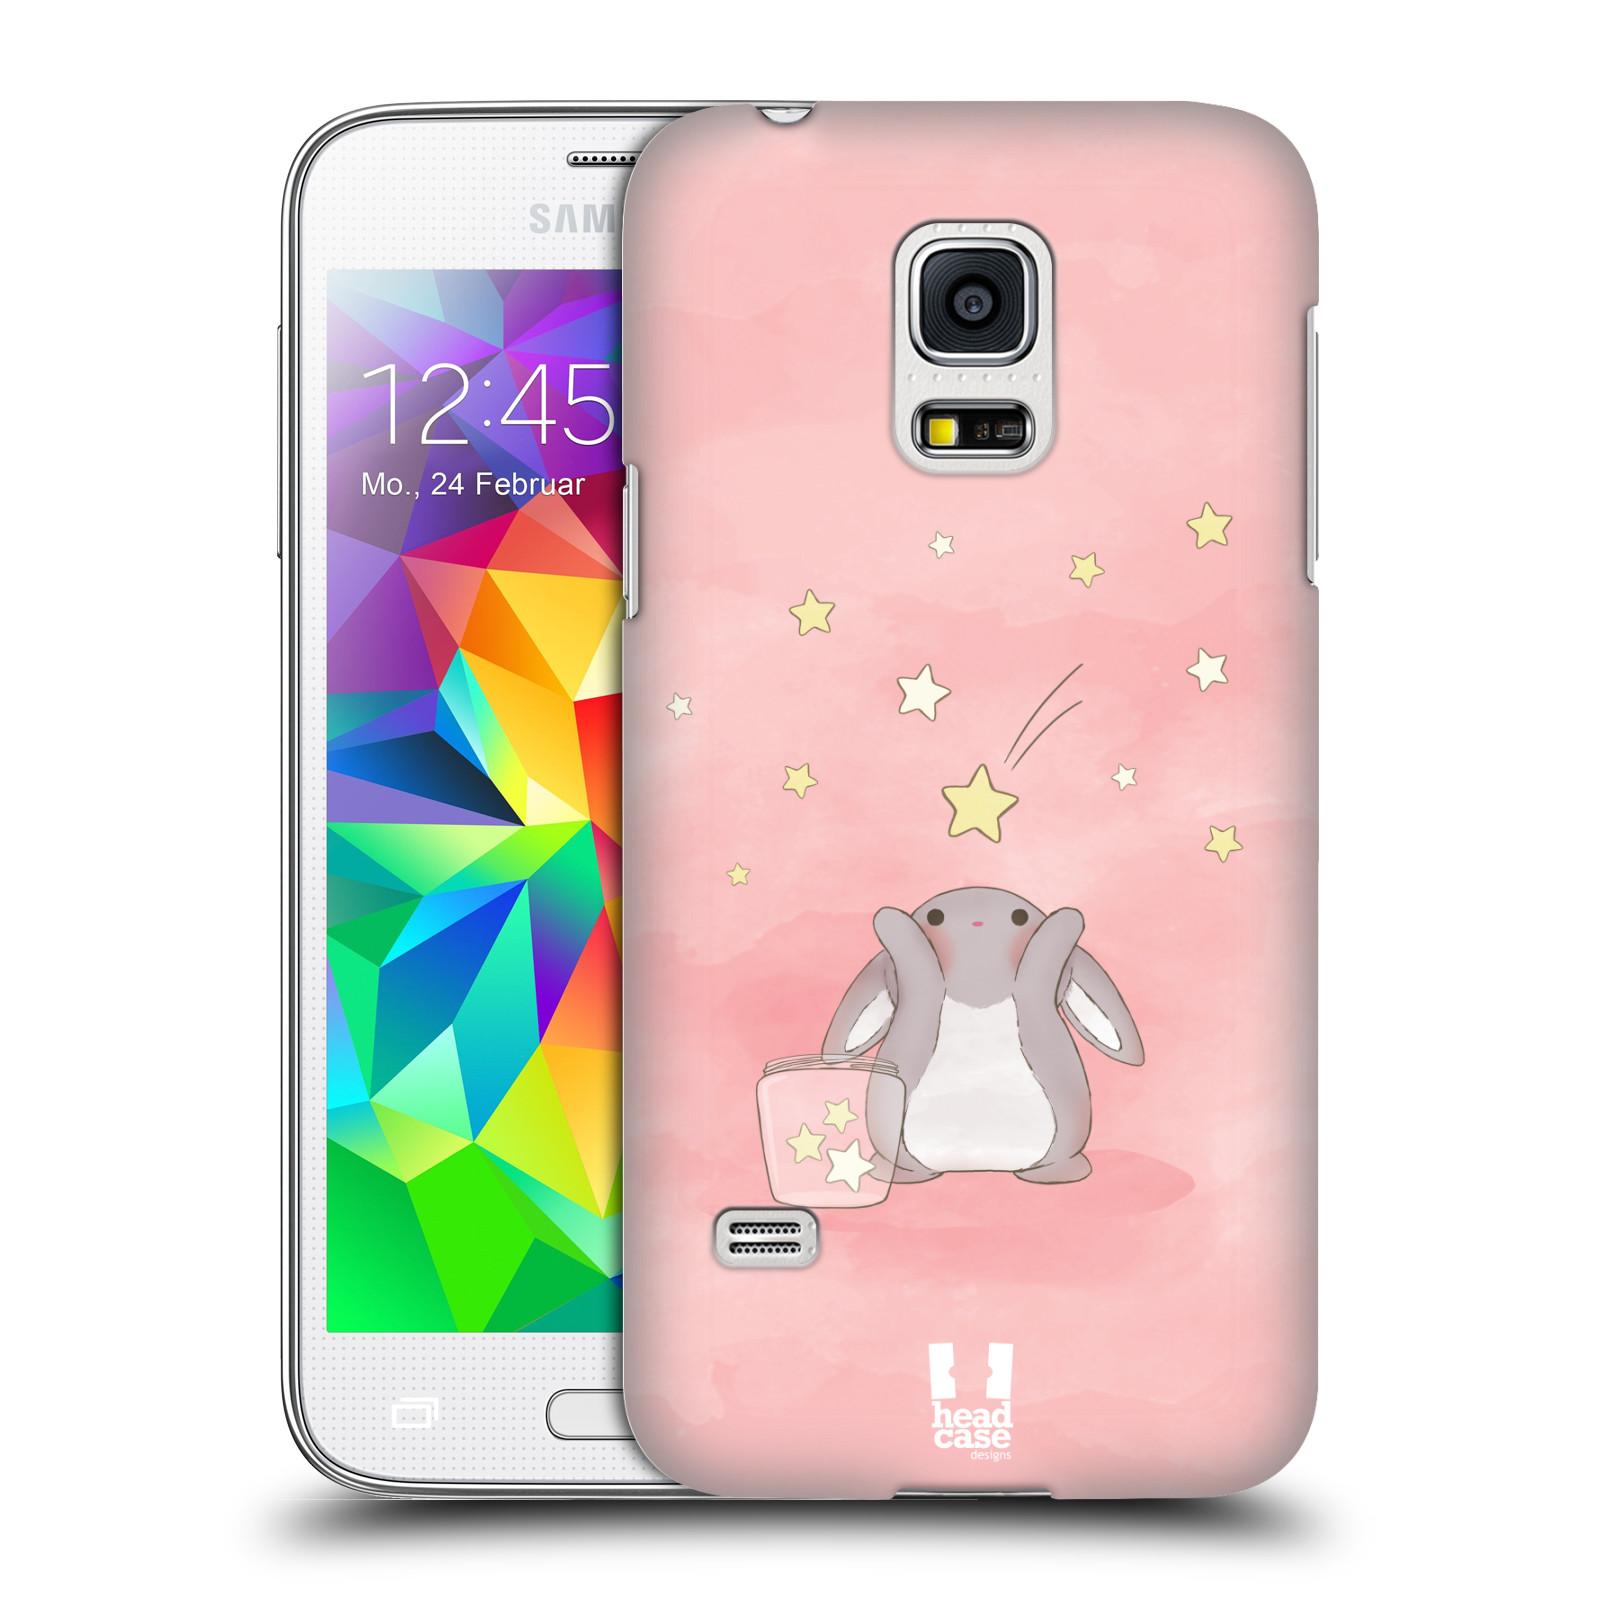 HEAD CASE plastový obal na mobil SAMSUNG Galaxy S5 MINI / S5 MINI DUOS vzor králíček a hvězdy růžová